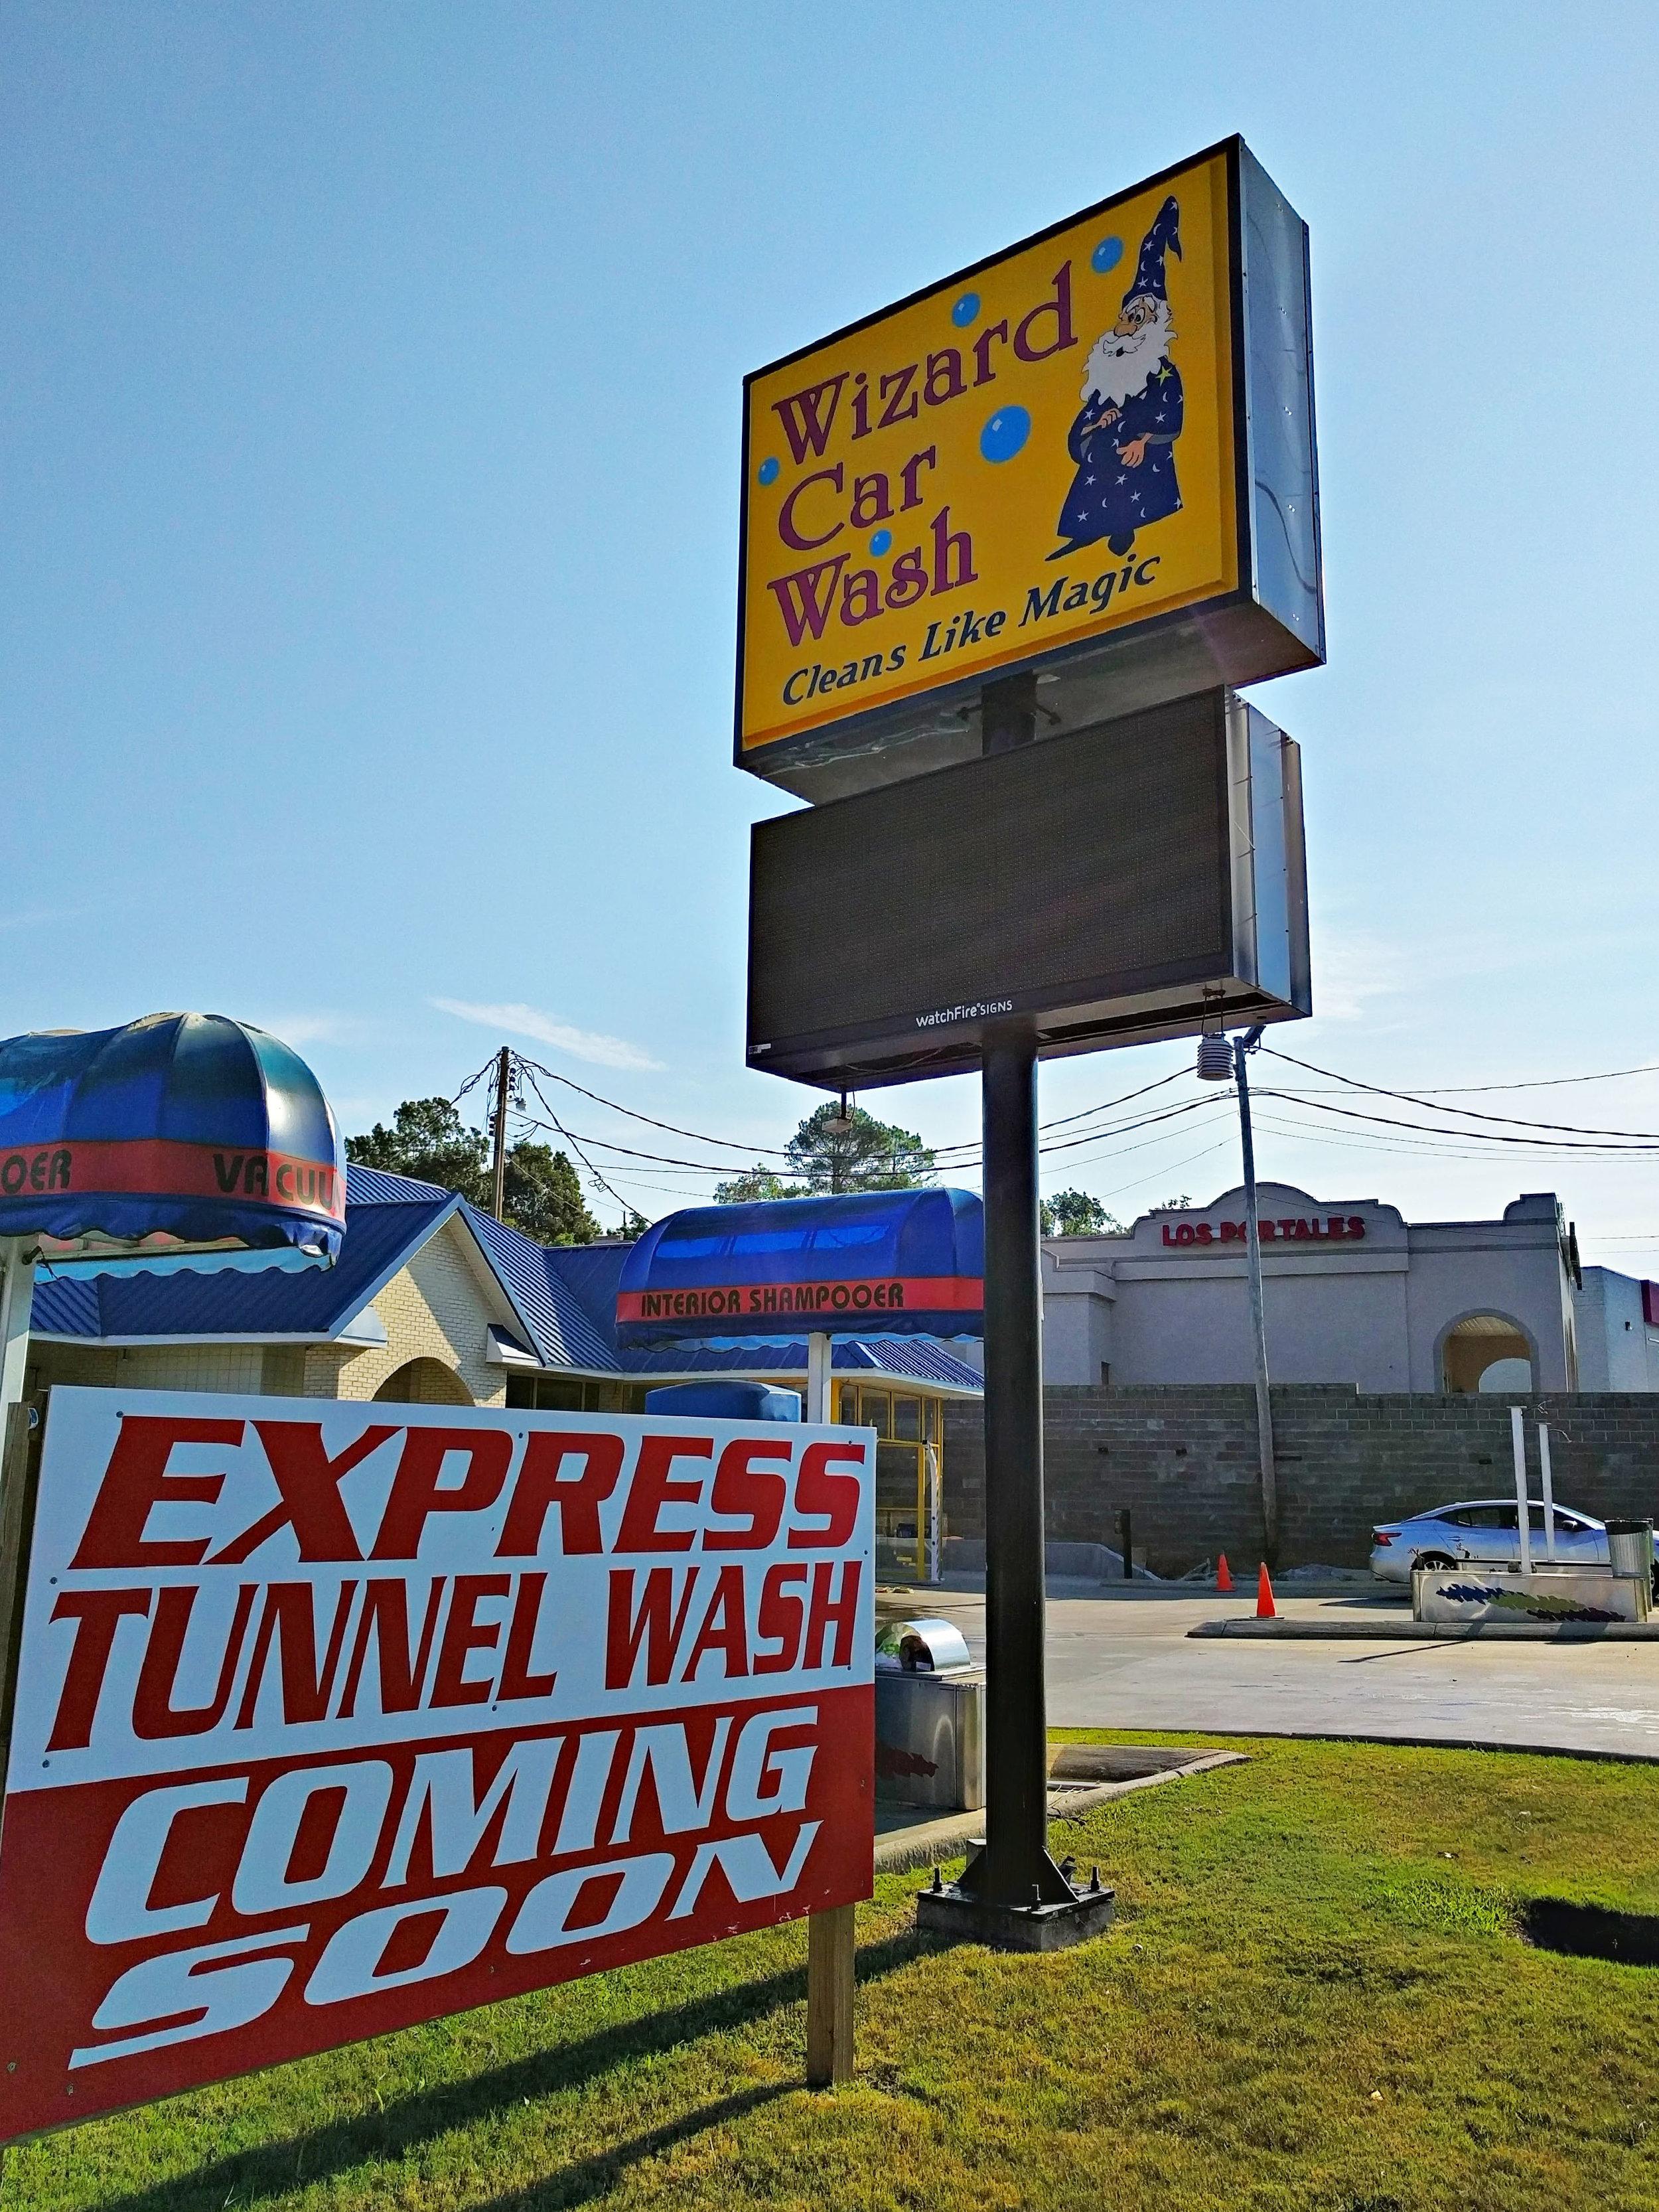 Wizard Car Wash